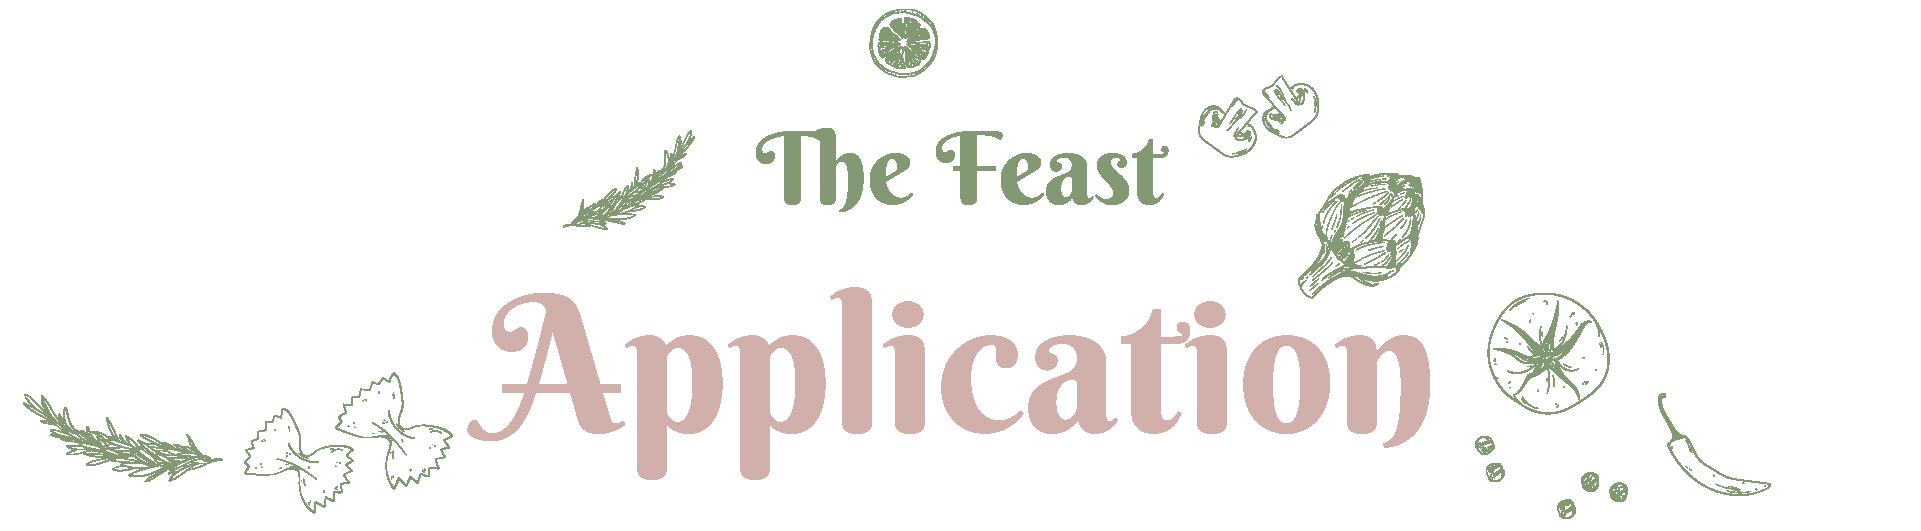 Feast_header_2_Application.png